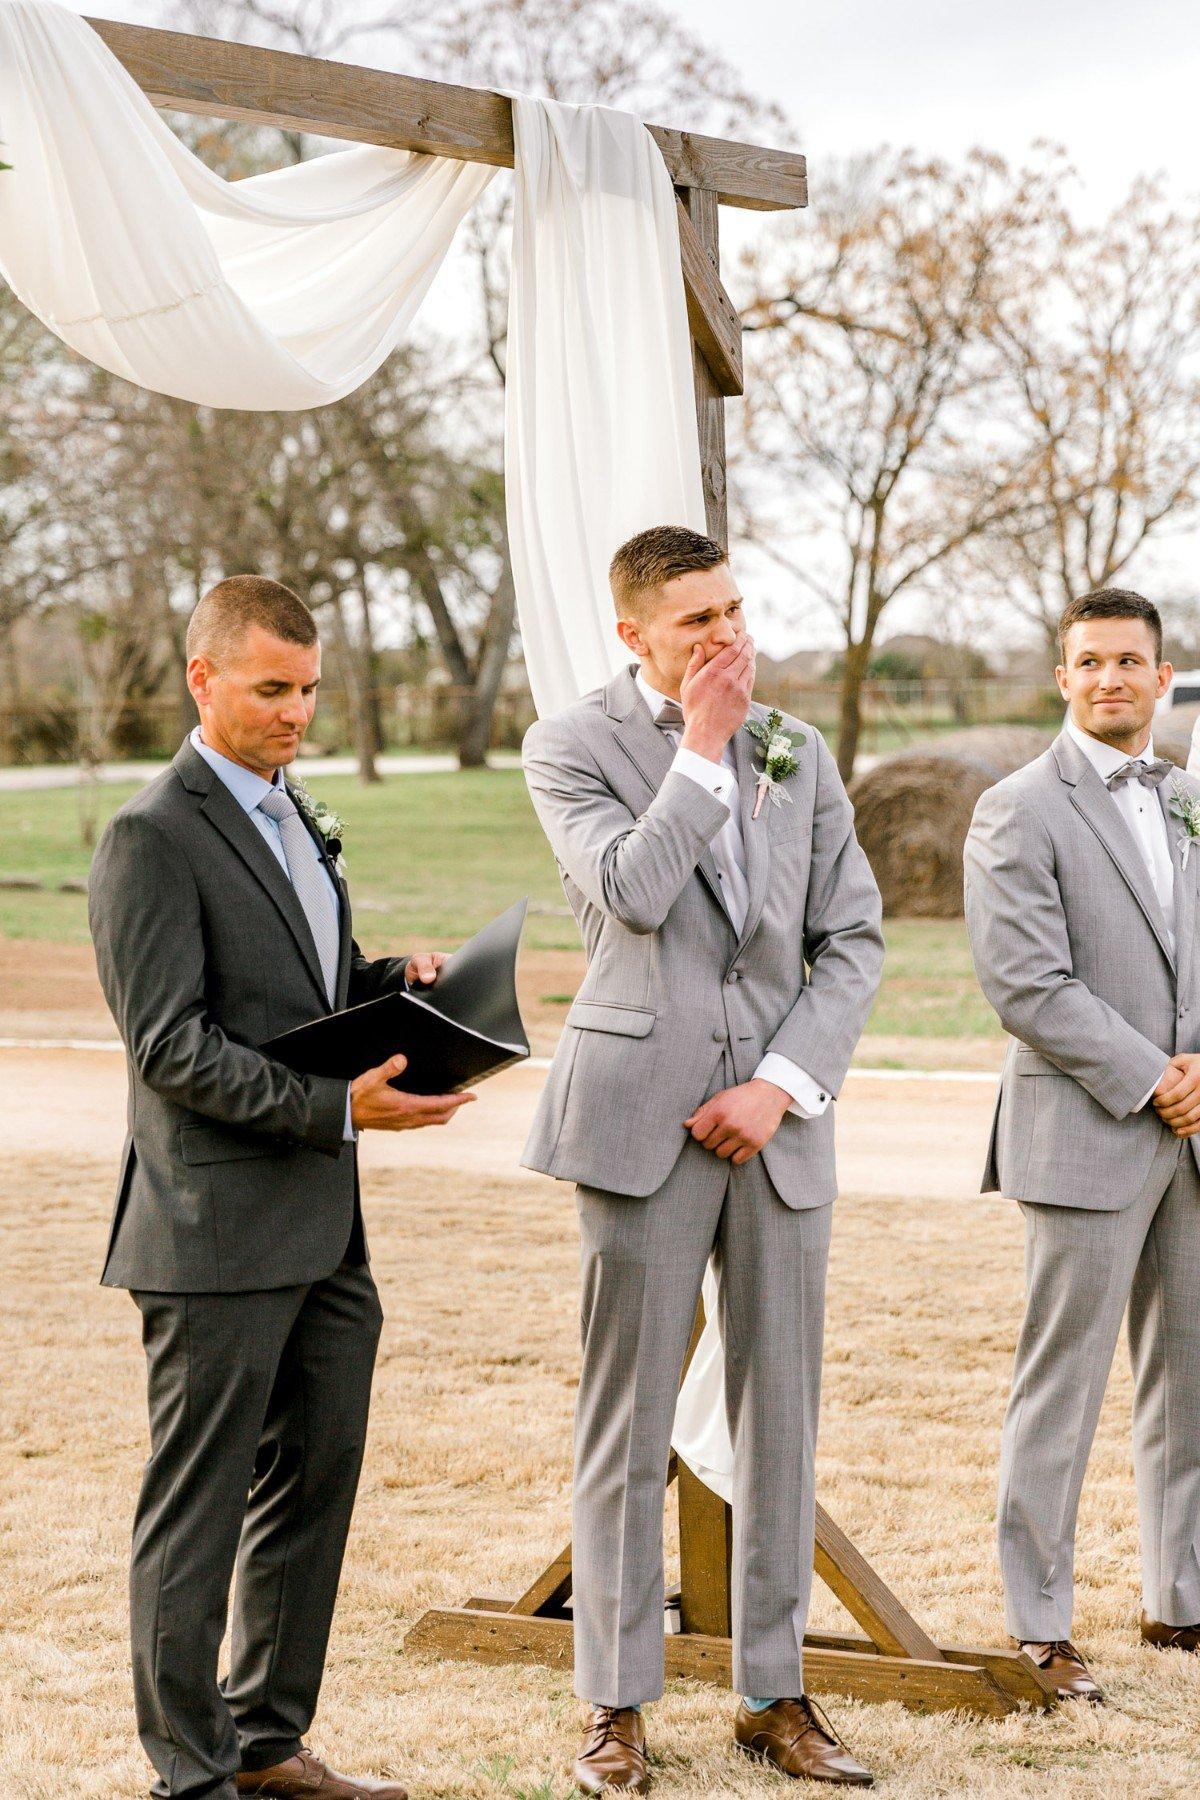 ennis-texas-wedding-photographer-kaitlyn-bullard-65.jpg